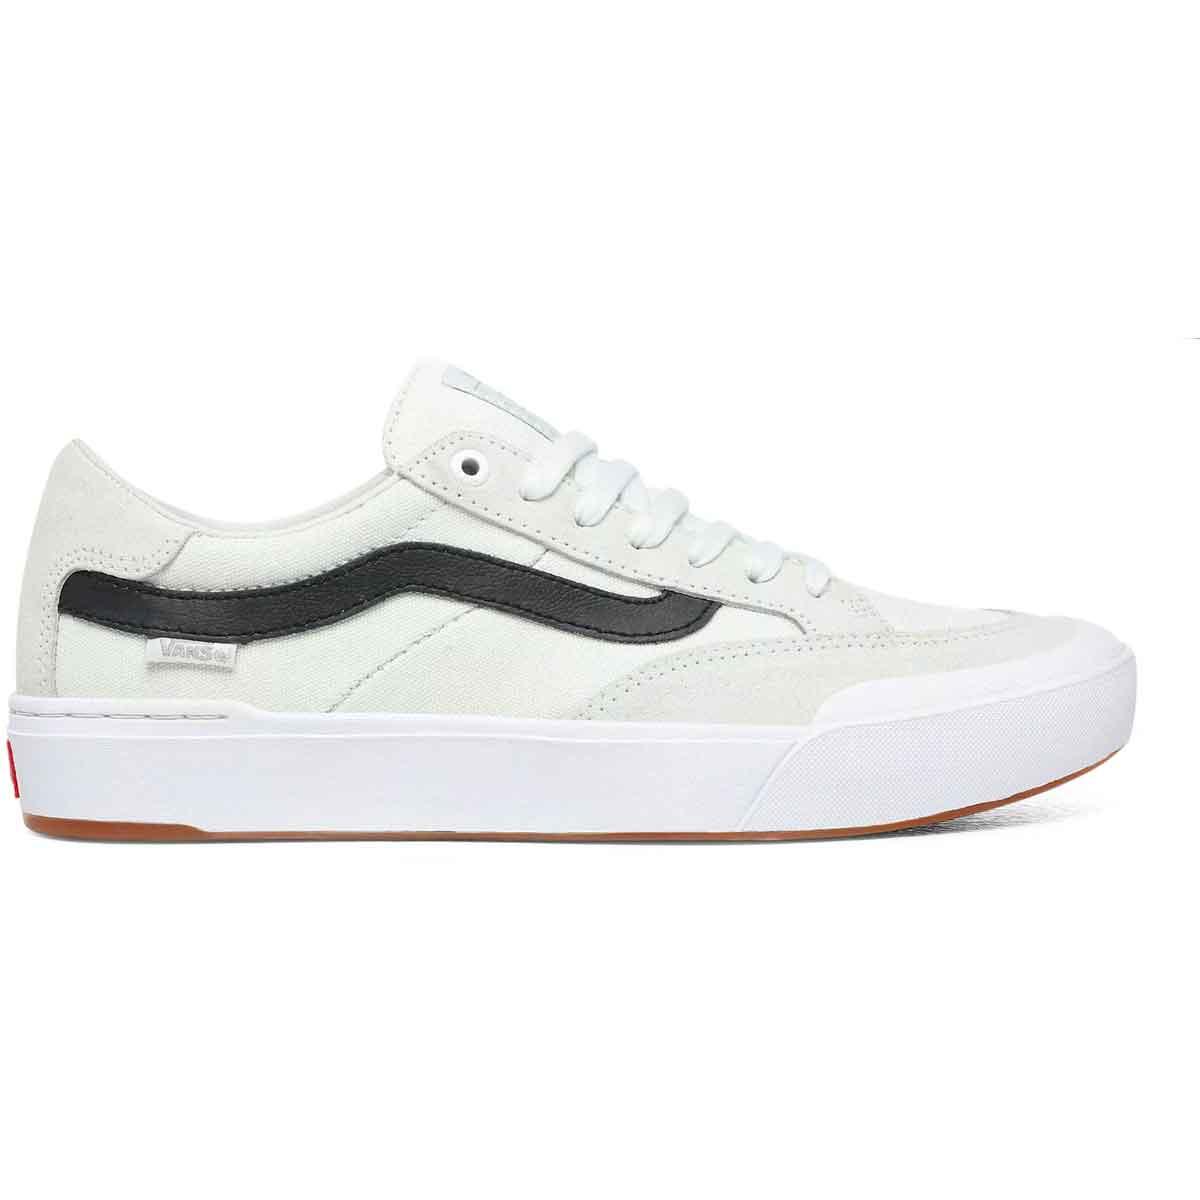 Vans Elijah Berle Pro Skate Shoes